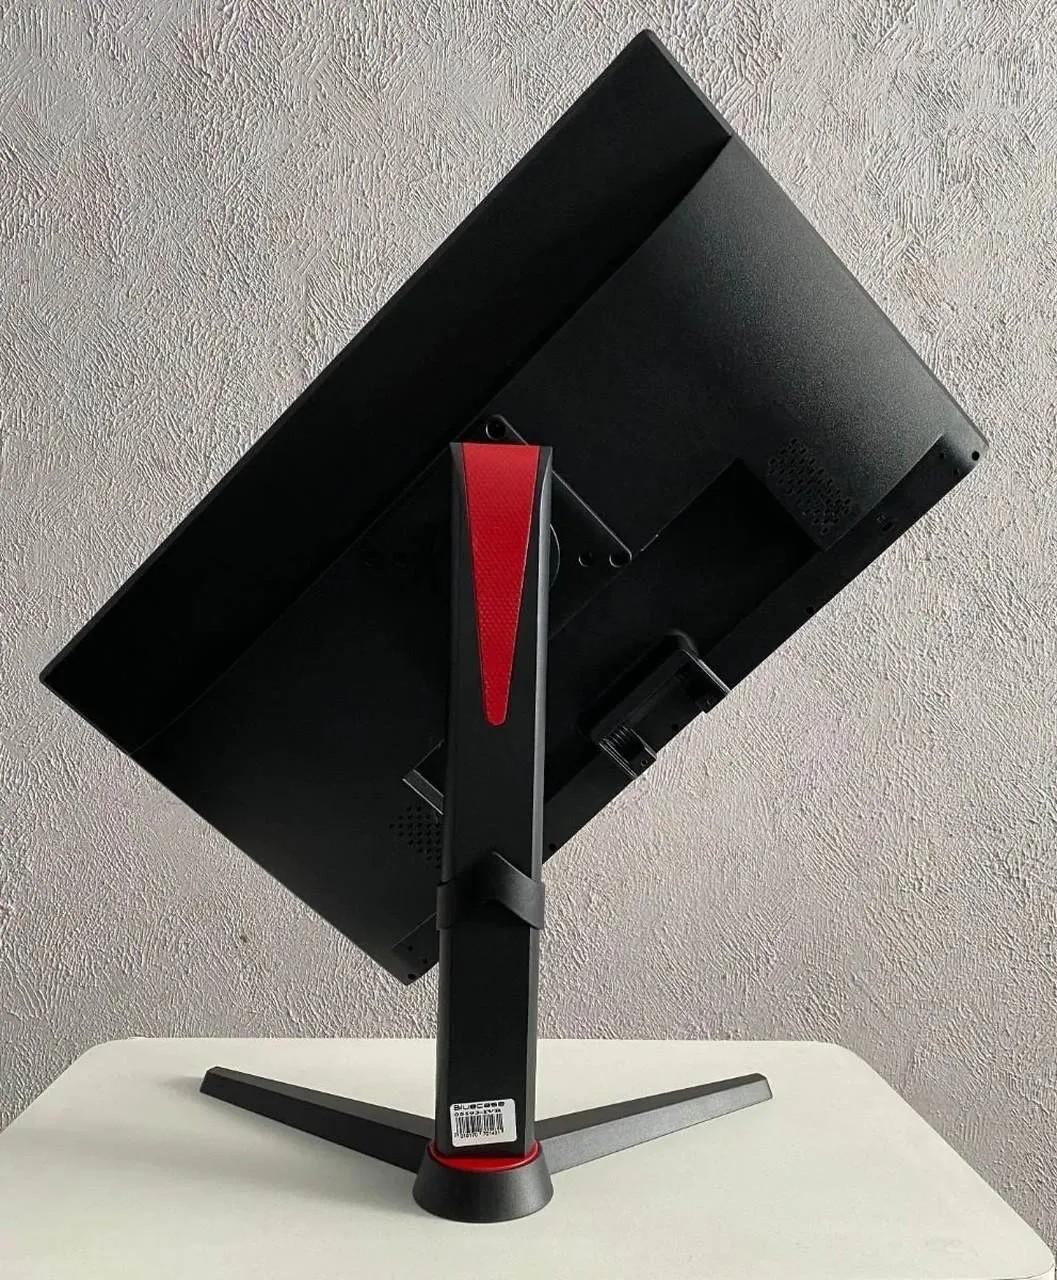 Suporte P/ Monitor Pedestal C/ Pivot 90º E Altura P/ Monitor Até 27 Bp-01a